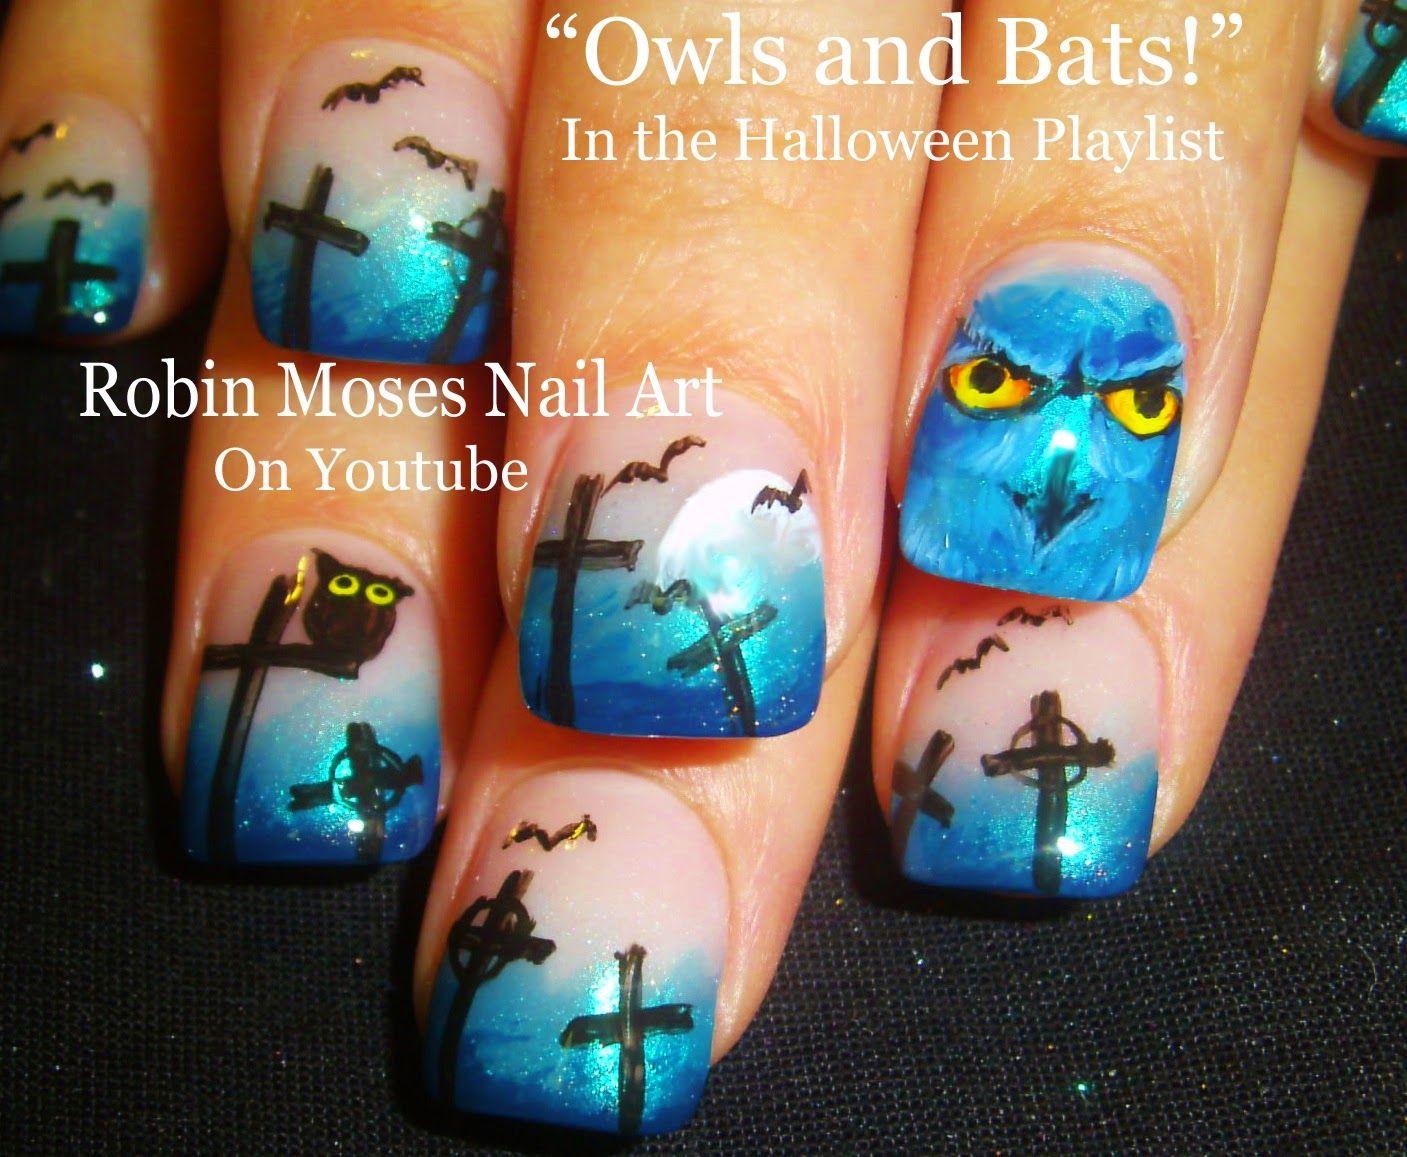 """owl nails"" ""halloween nails"" ""cute halloween nails"" ""cute halloween art"" ""halloween clip art"" ""halloween nail art"" ""black cat nails"" ""bat nails"" ""spiderweb nails"" ""fall nail art"" ""cute halloween designs"""